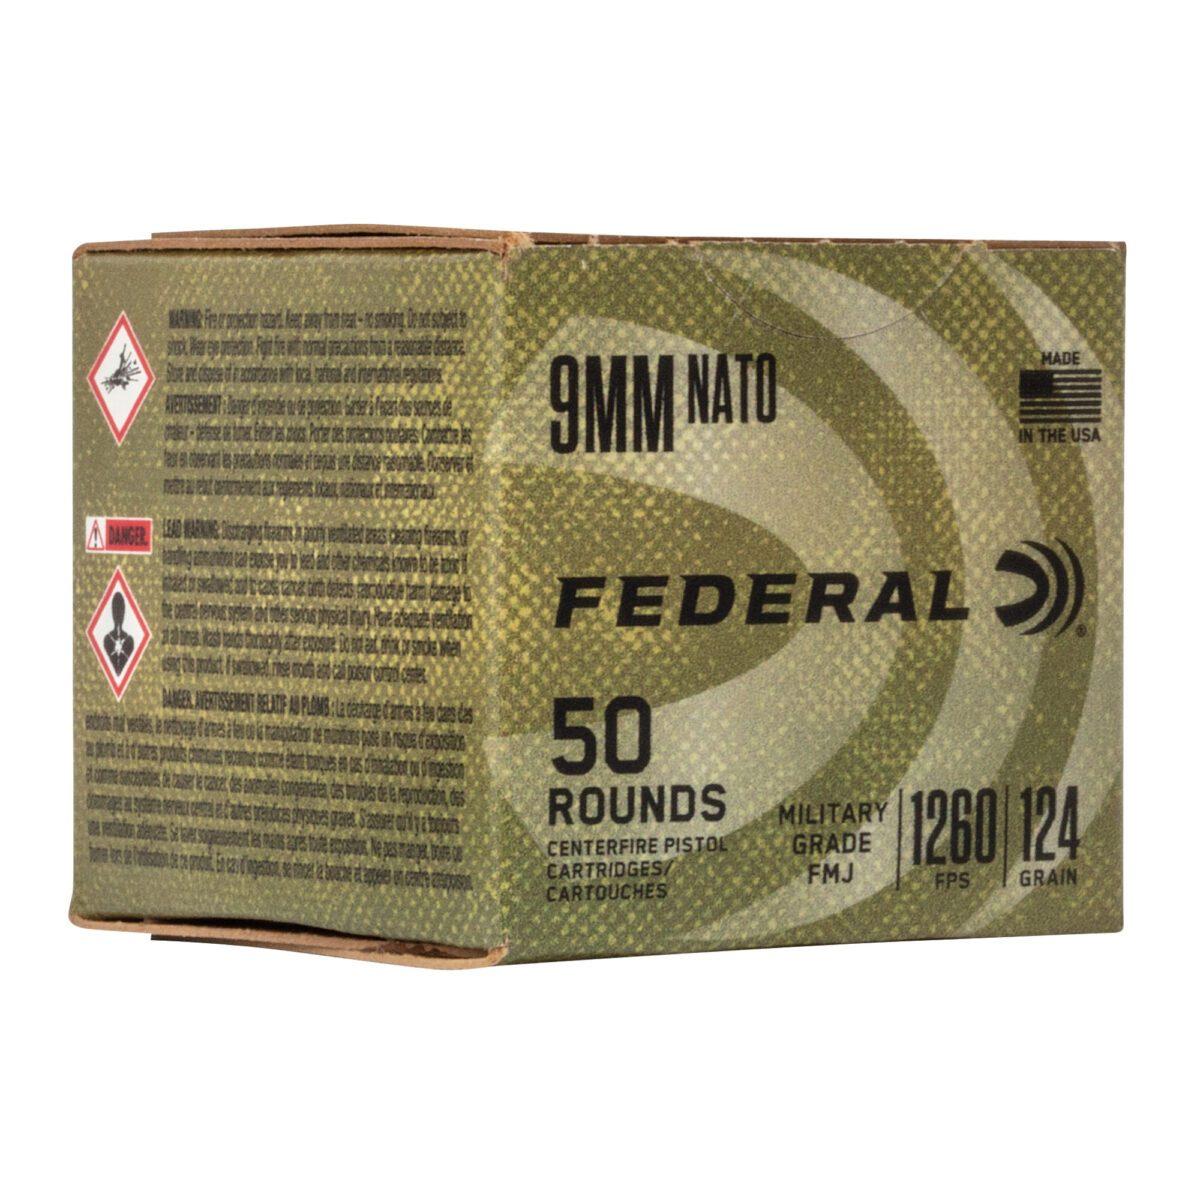 federal military grade 9mm ammo box